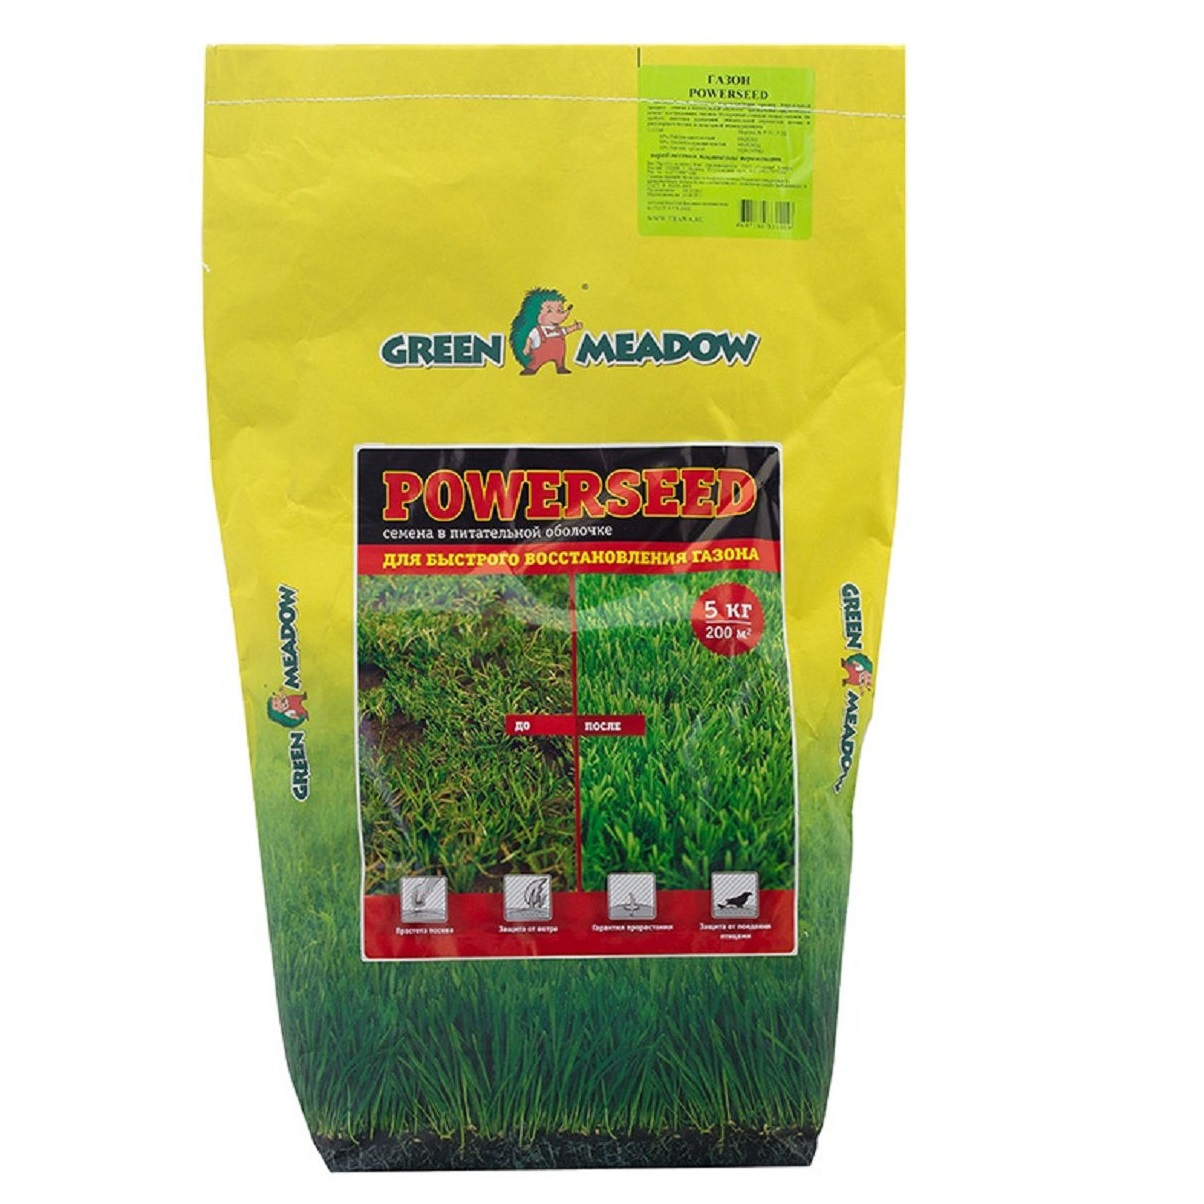 Газон Green Meadow powerseed быстрый ремонт 5 кг